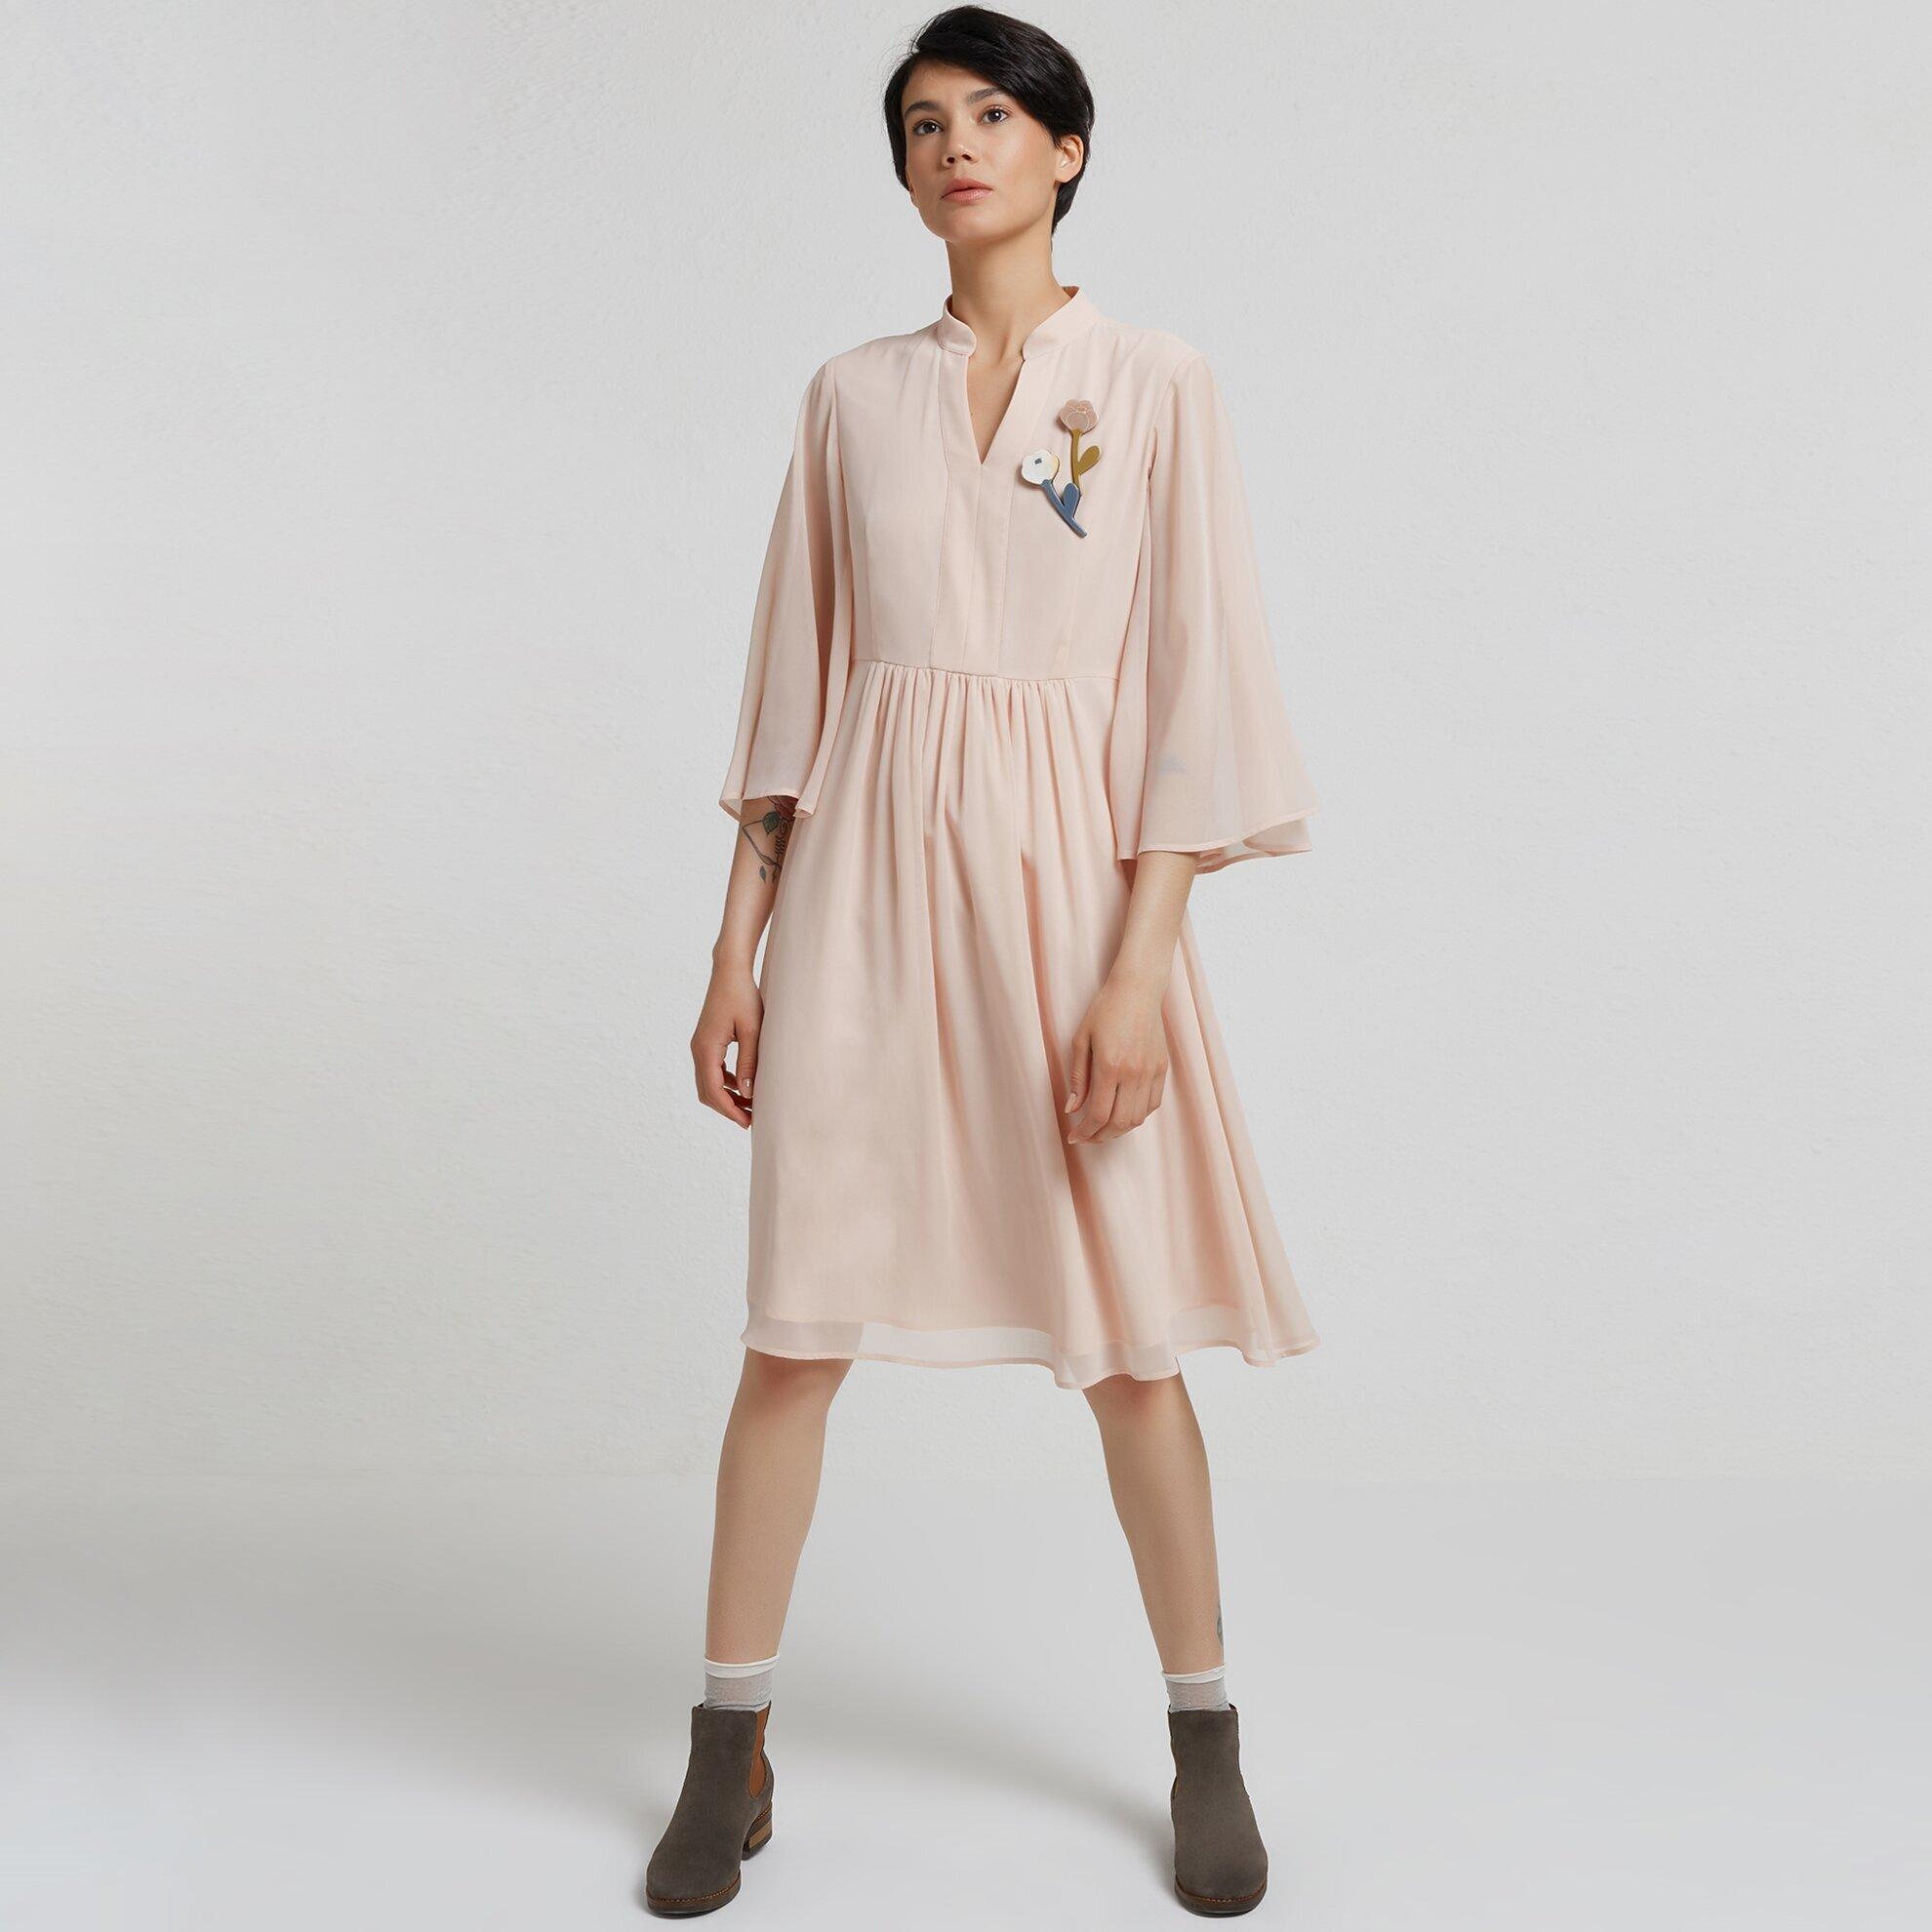 Bathwing Midi Dress